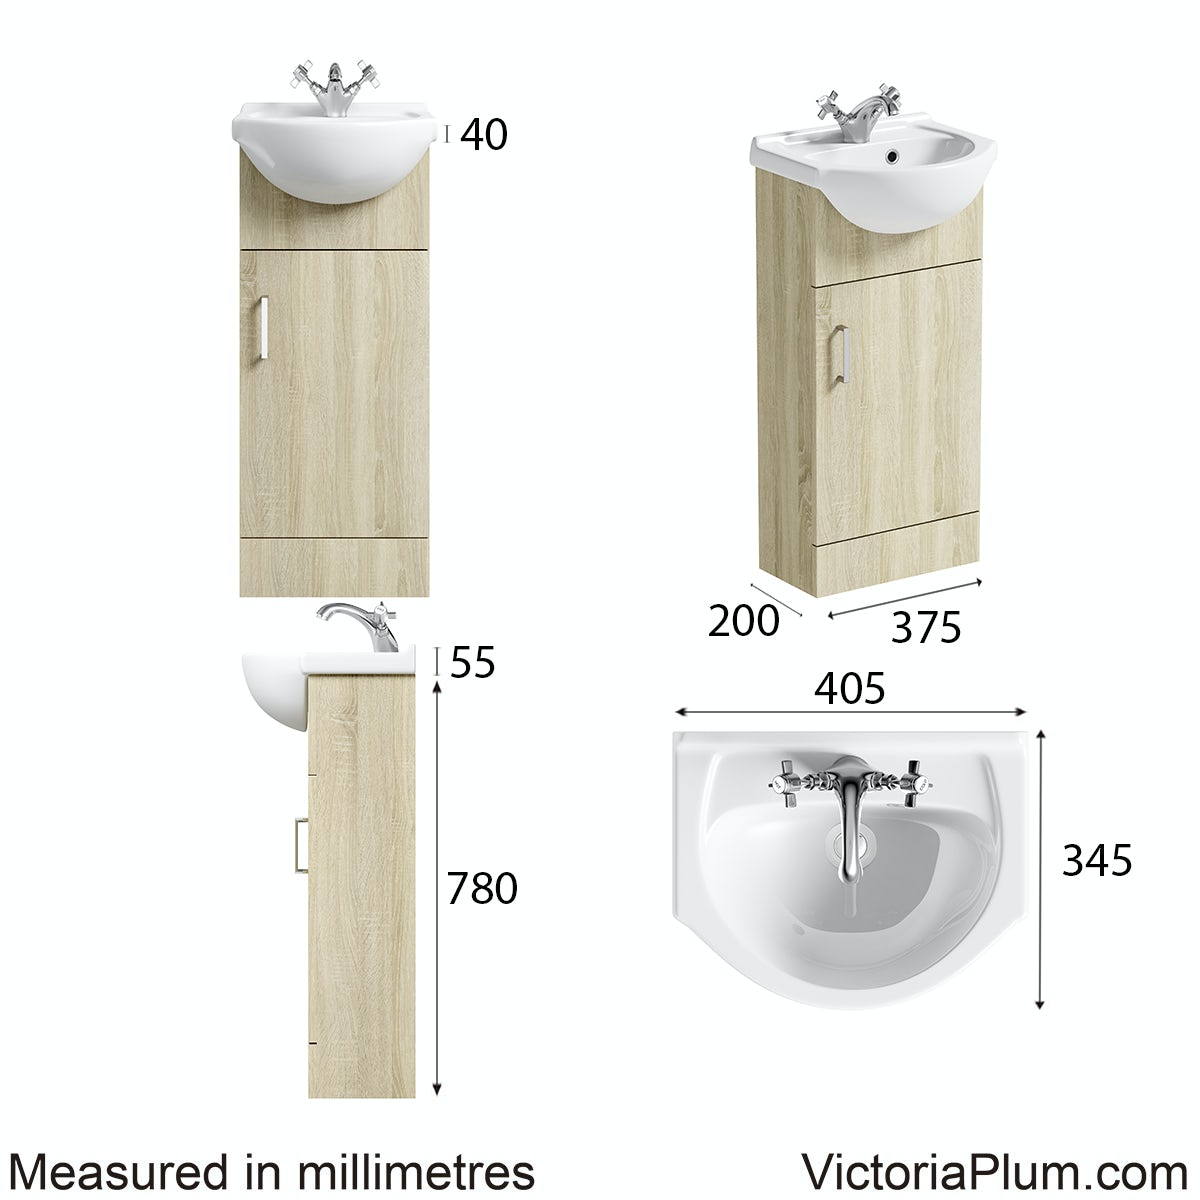 Dimensions for Orchard Eden oak vanity unit and basin 410mm